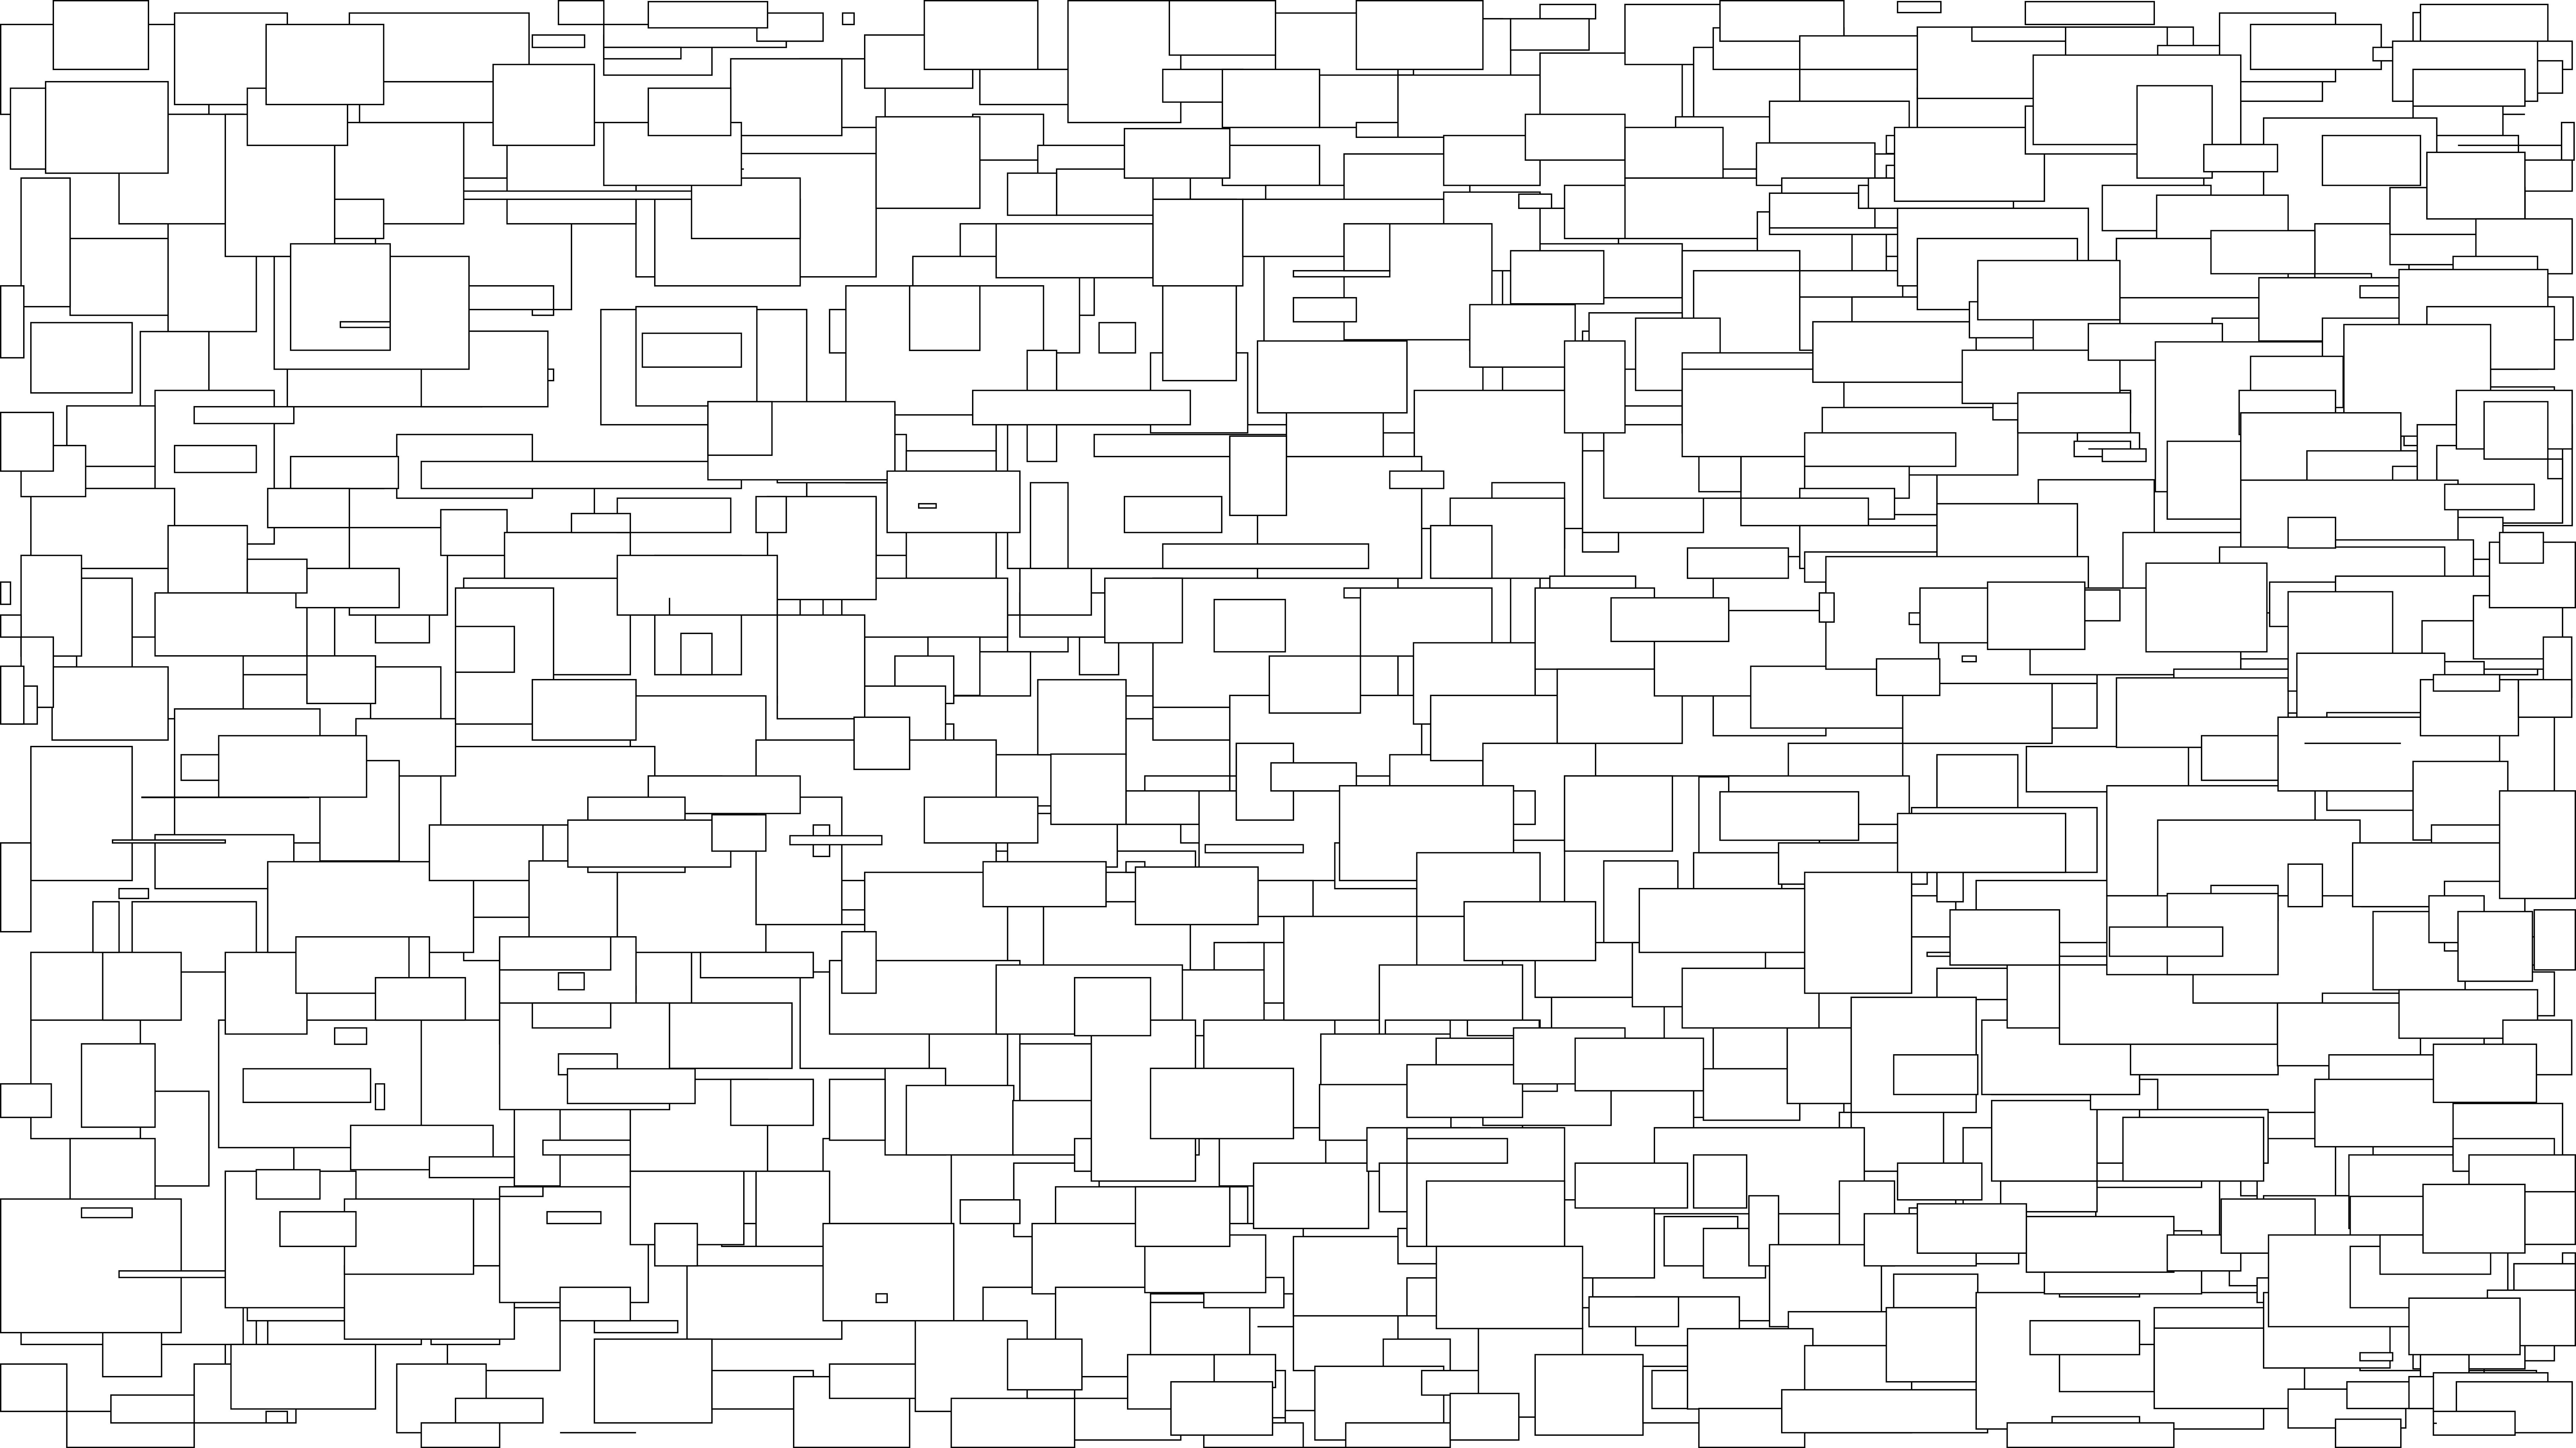 Black And White Minimalist 1920x1080 R Wallpaper Wallpaper Hd Wallpaper